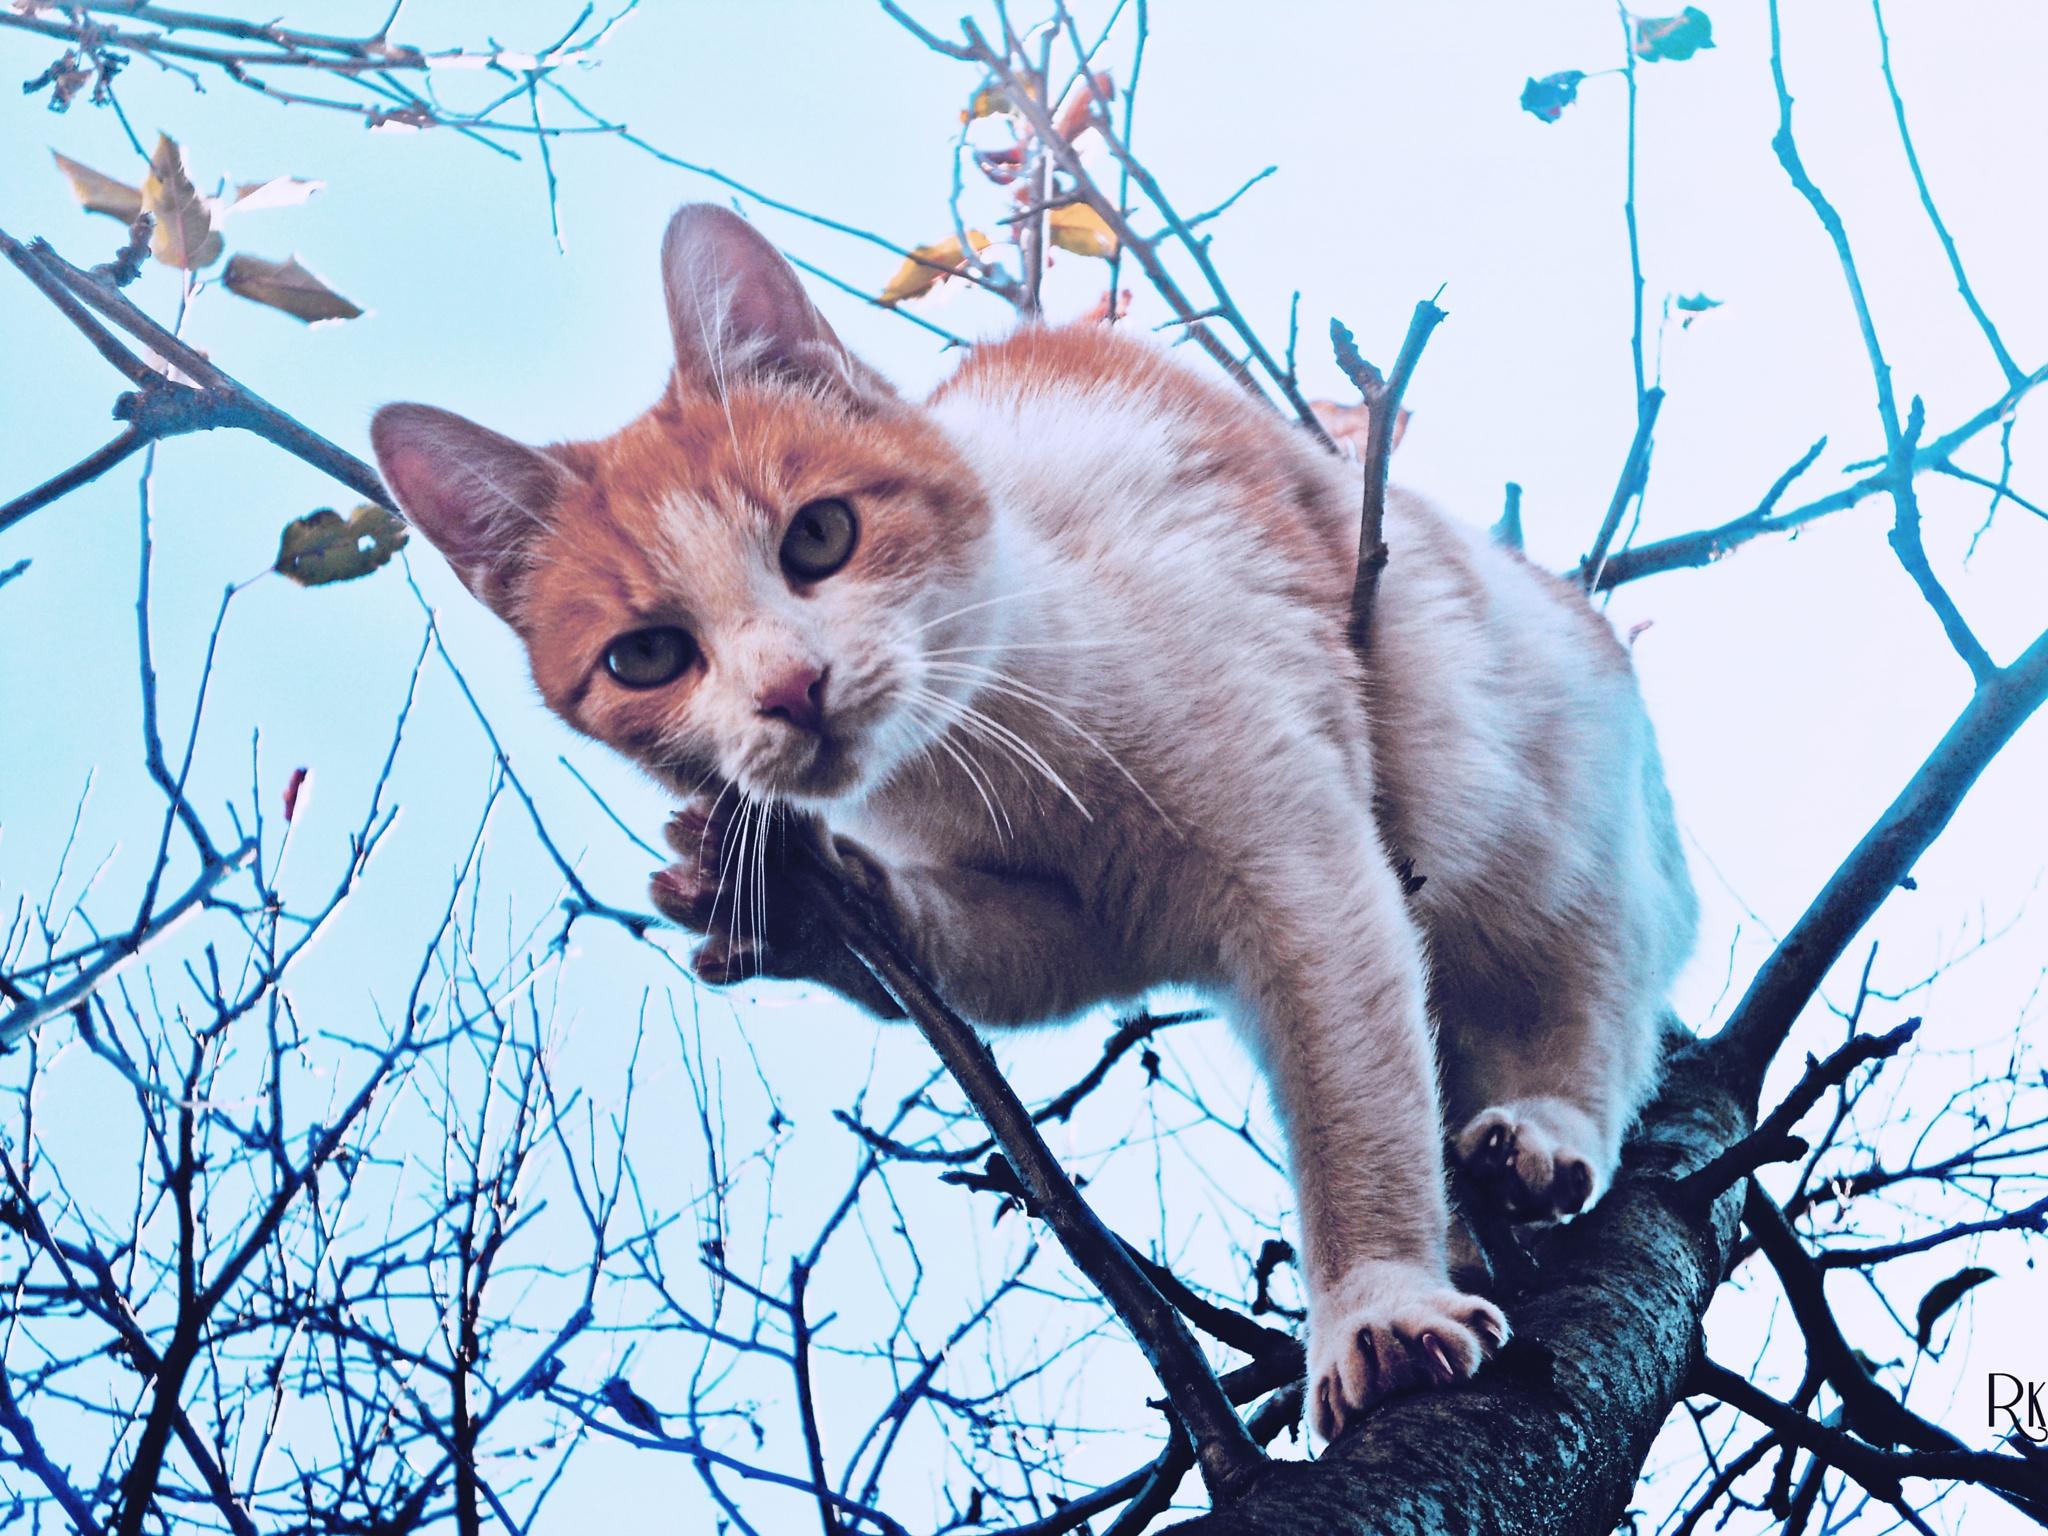 Cat @catedition6 by Robert Krstevski